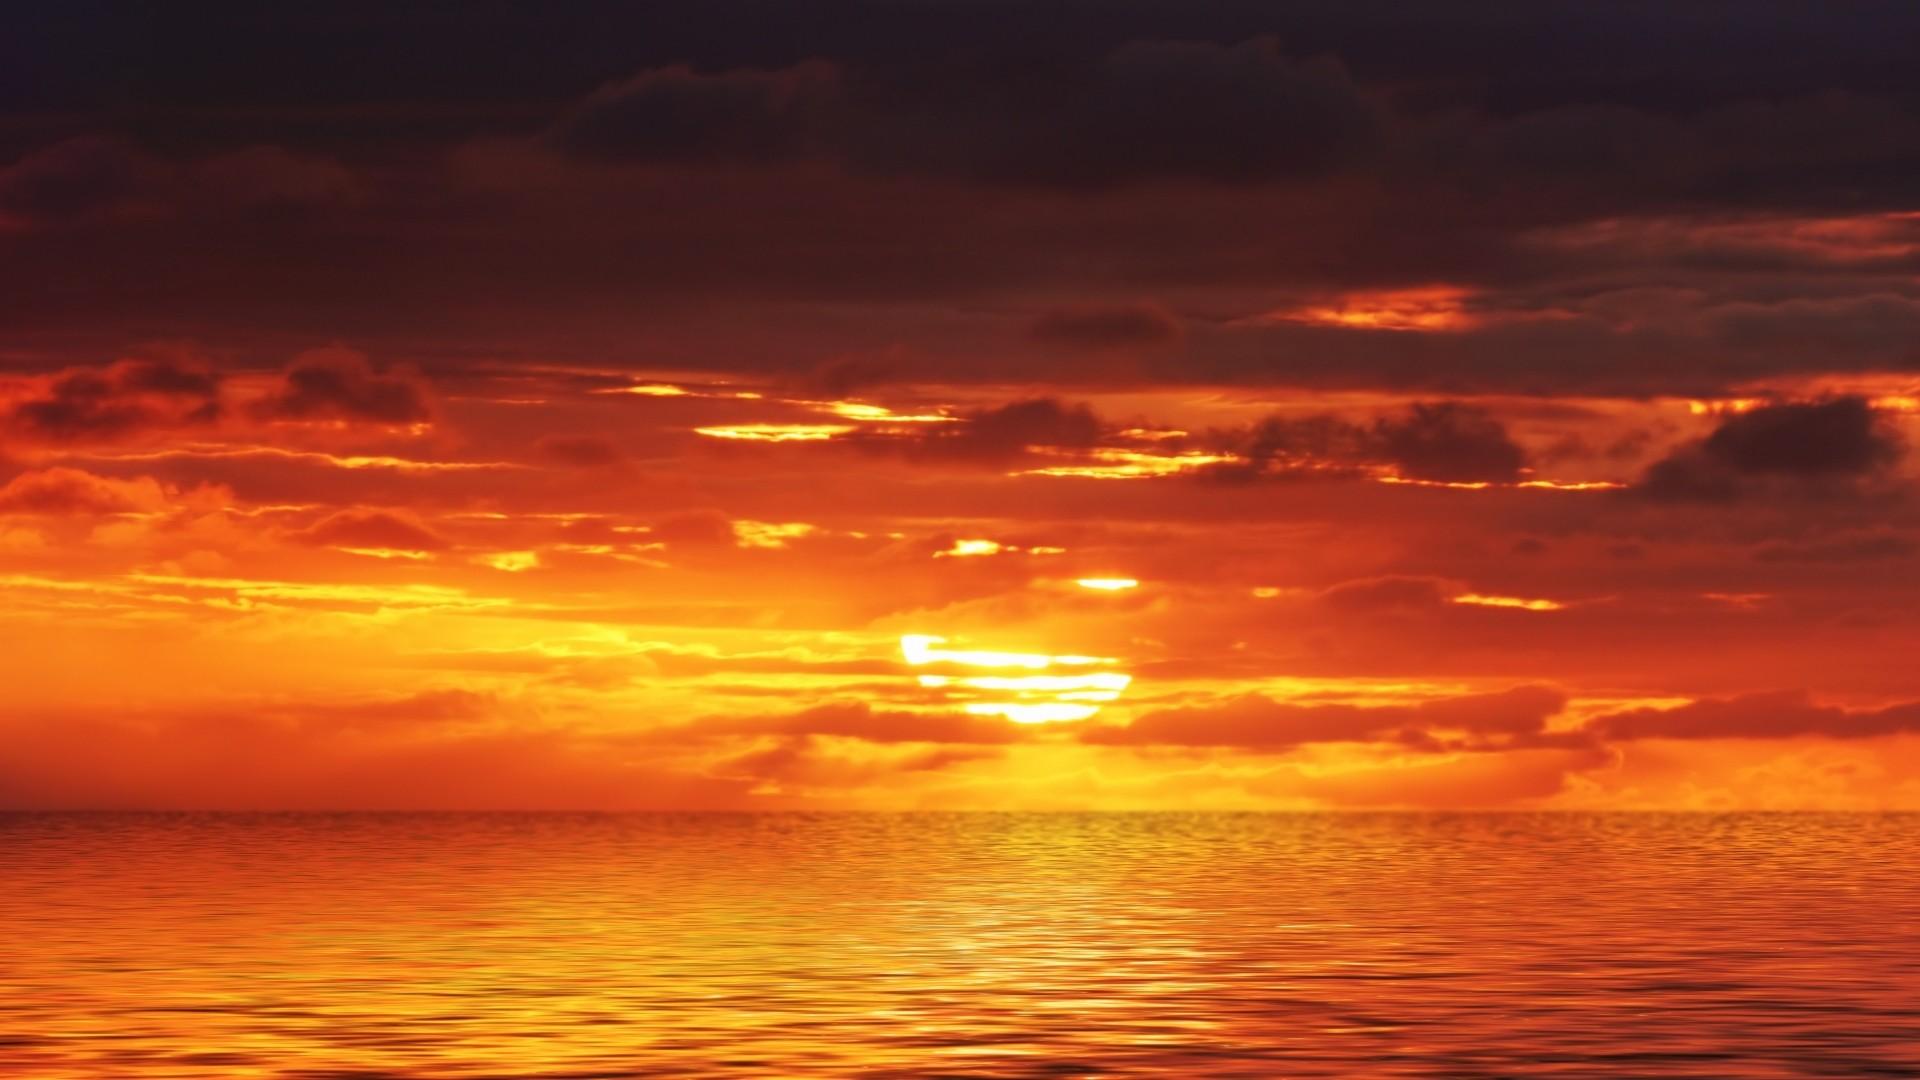 Orange Sunset Wallpaper-8